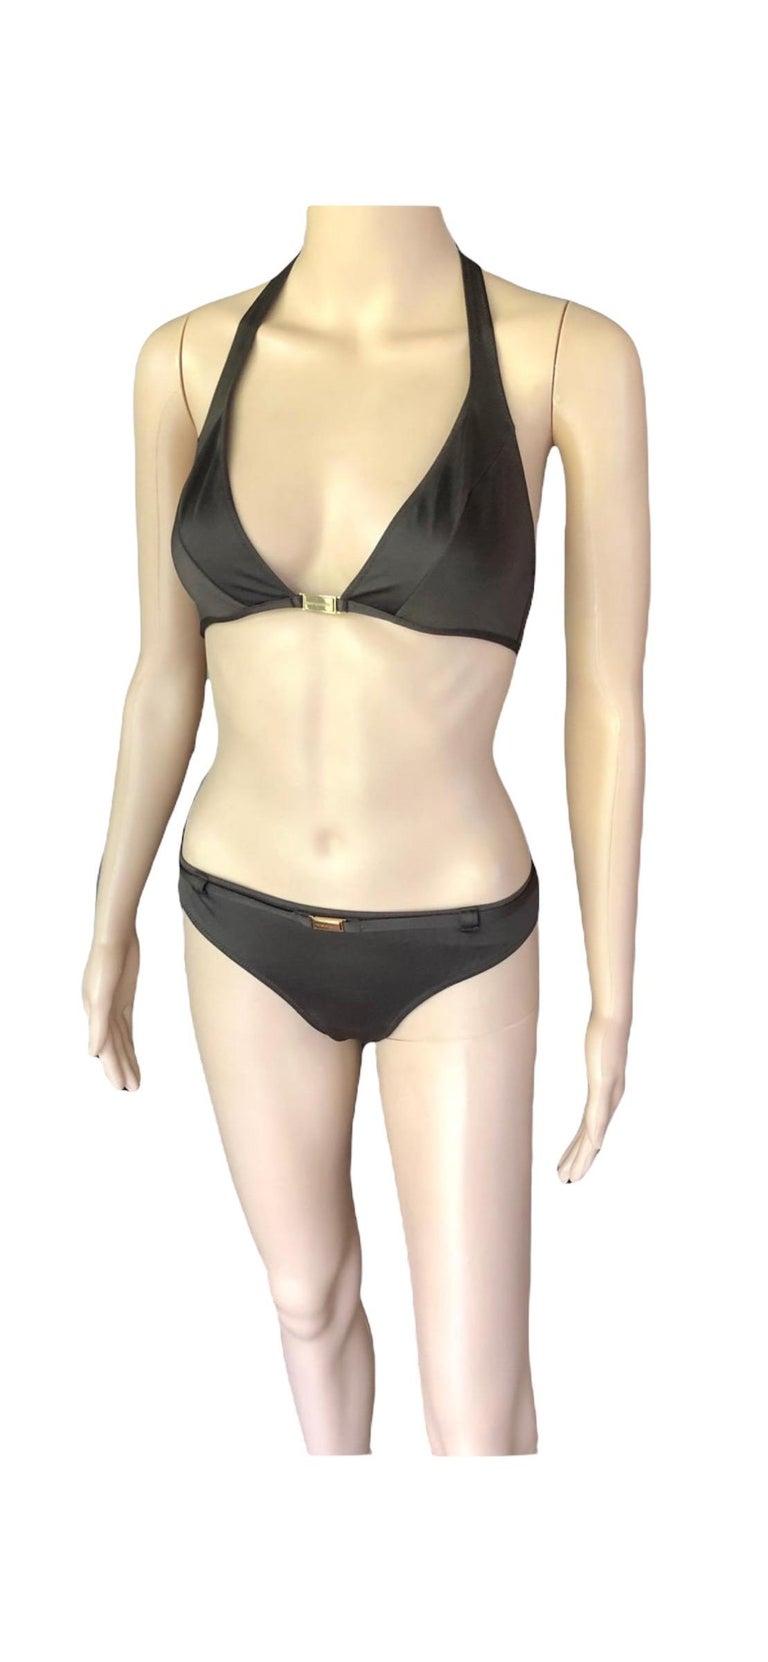 Dolce & Gabbana Logo Embellished Belted Brown Bikini Swimwear Swimsuit 2 Piece For Sale 3